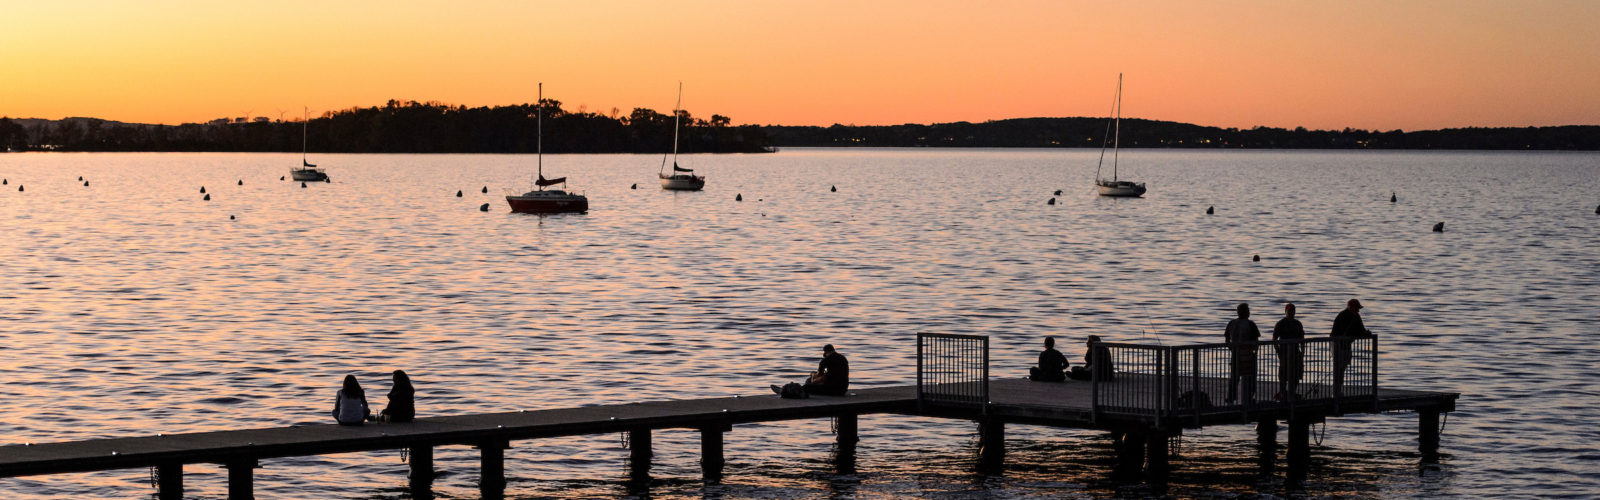 Godspeed Pier at sunset